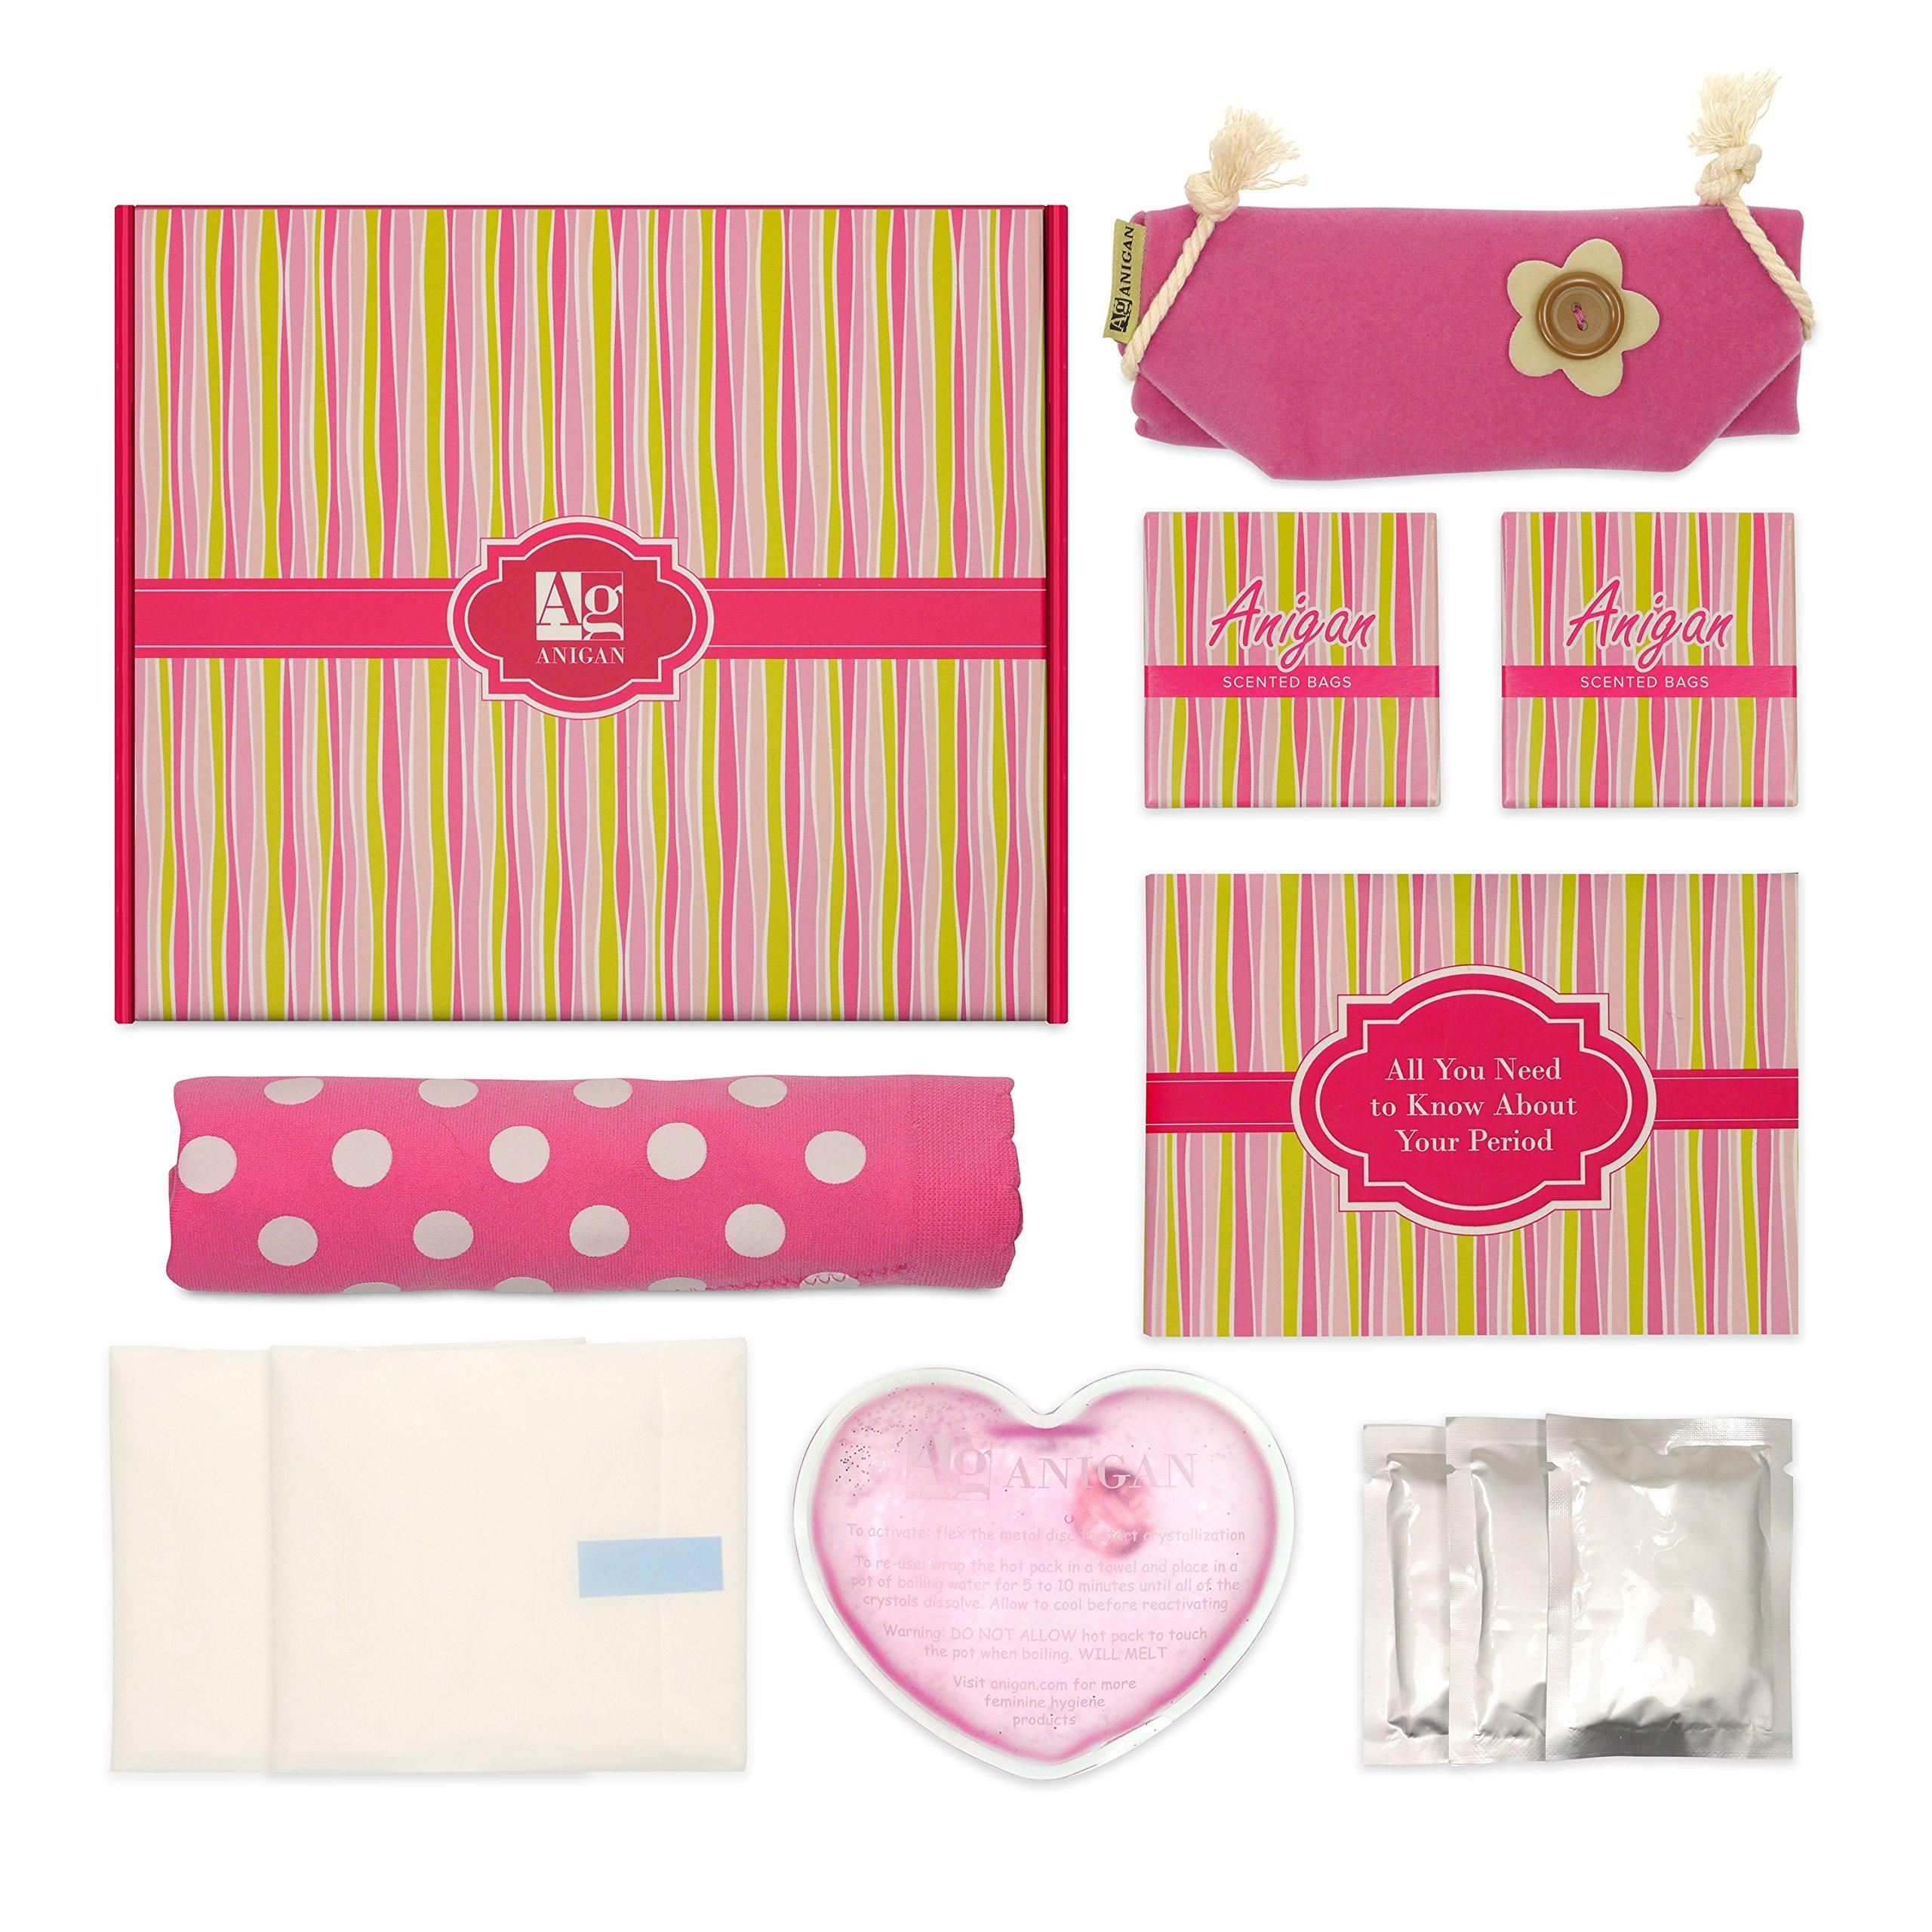 Anigan First Period Kit with Stylish Leakproof Bikini Menstrual Underwear - Medium by Anigan